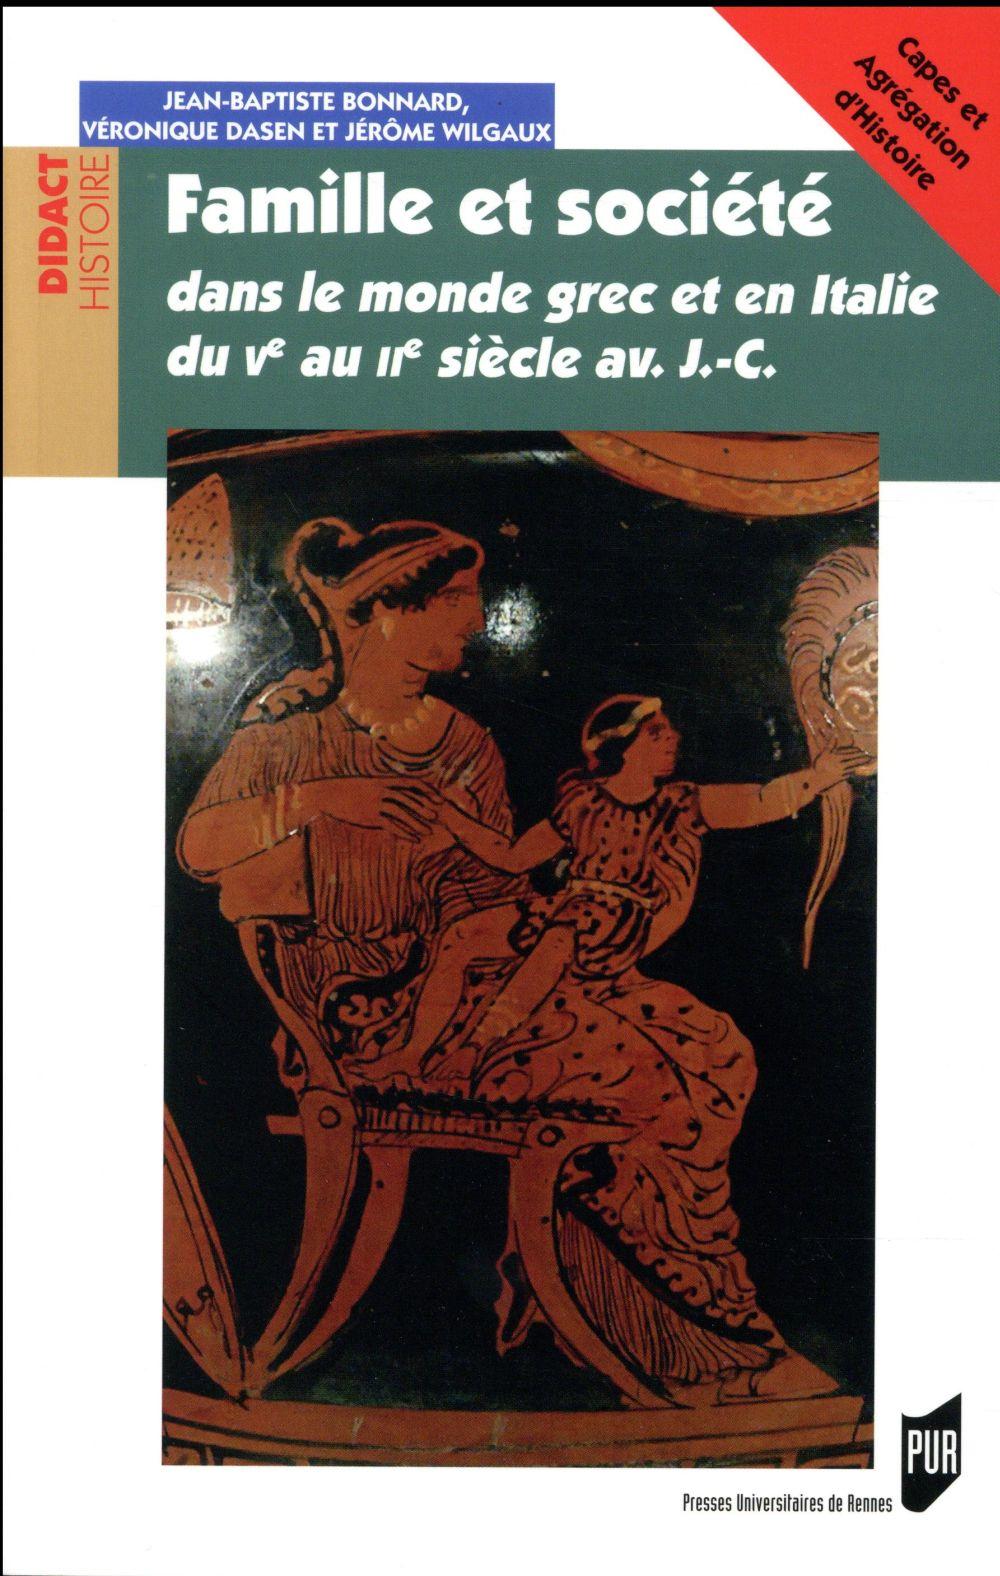 Famille et société dans le monde grec et en Italie ; du Ve siècle av. J.-C. au IIe siècle av. J.-C.